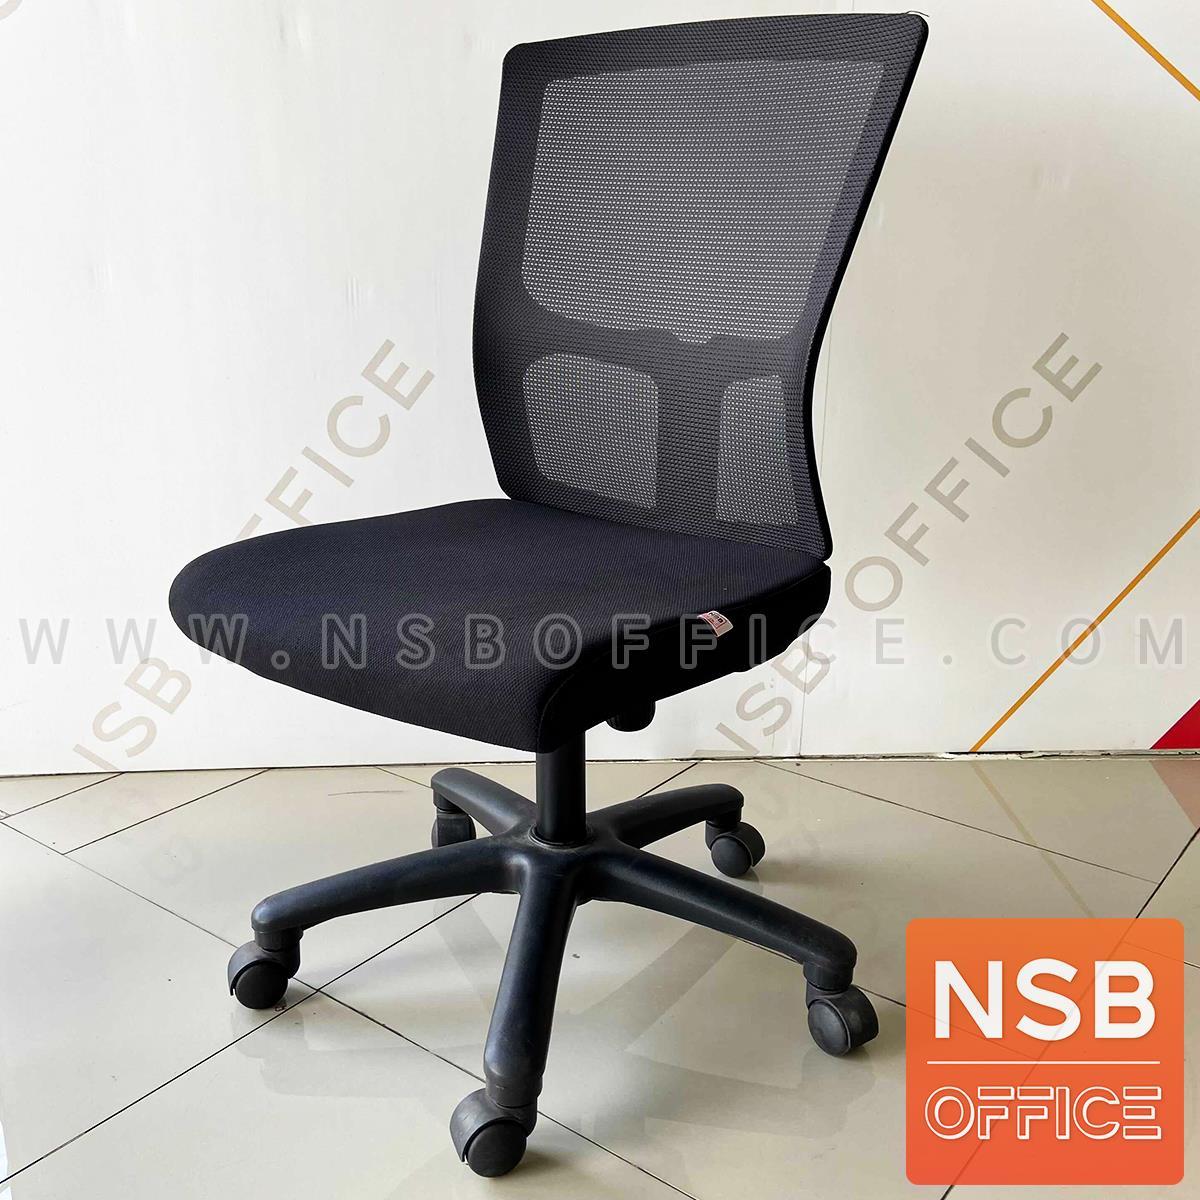 B33A003:เก้าอี้สำนักงานหลังเน็ต ไม่มีท้าวแขน รุ่น Lazenby (เลเซนบี) โช๊คแก๊ส มีก้อนโยก ขาเหล็กชุบโครเมี่ยม